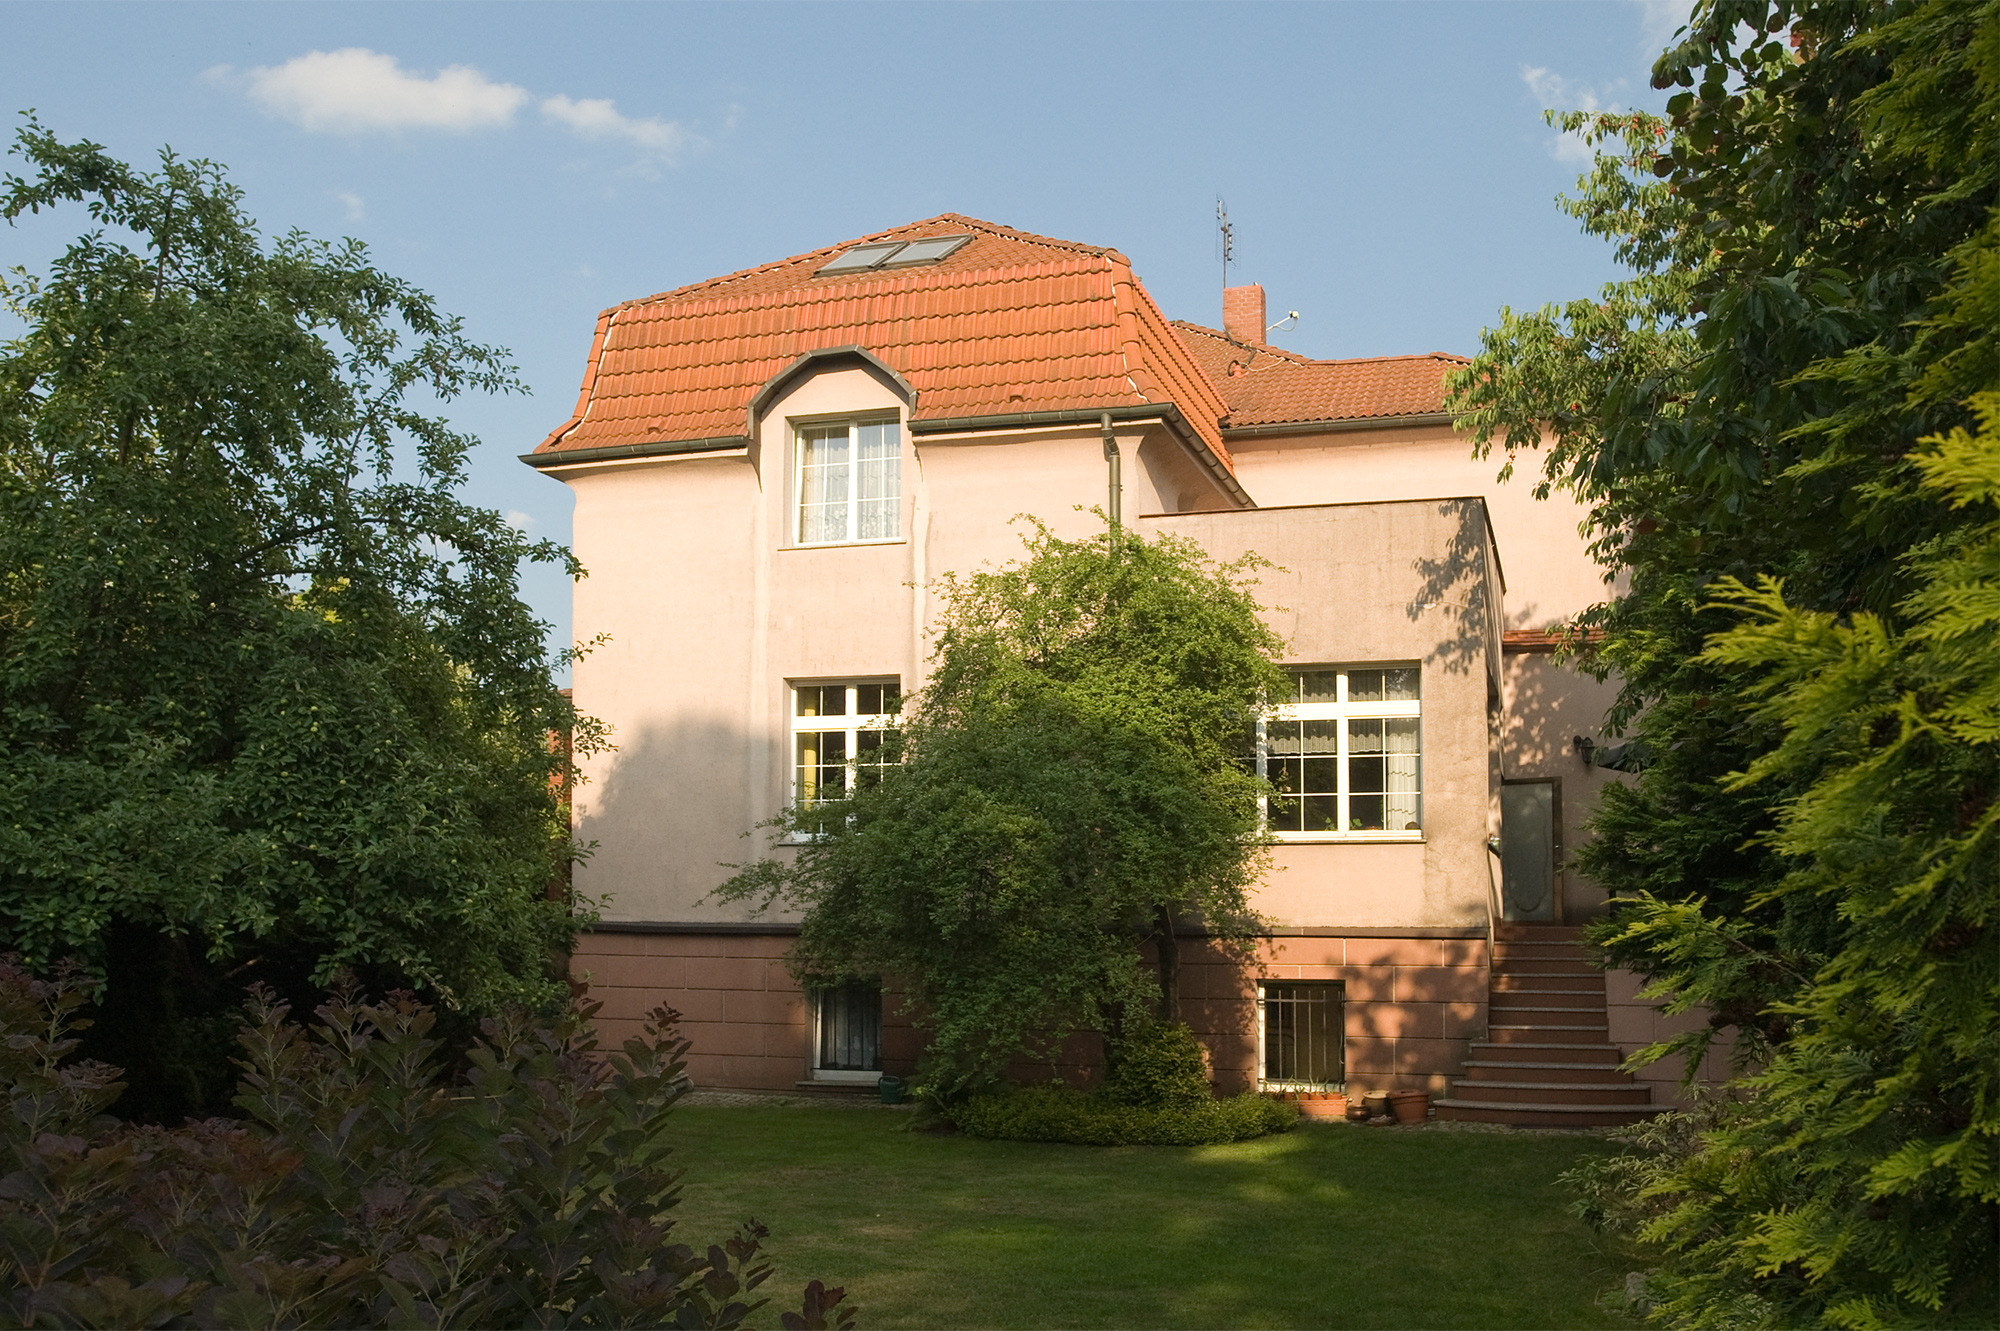 Wrocław | Borek | Sudecka